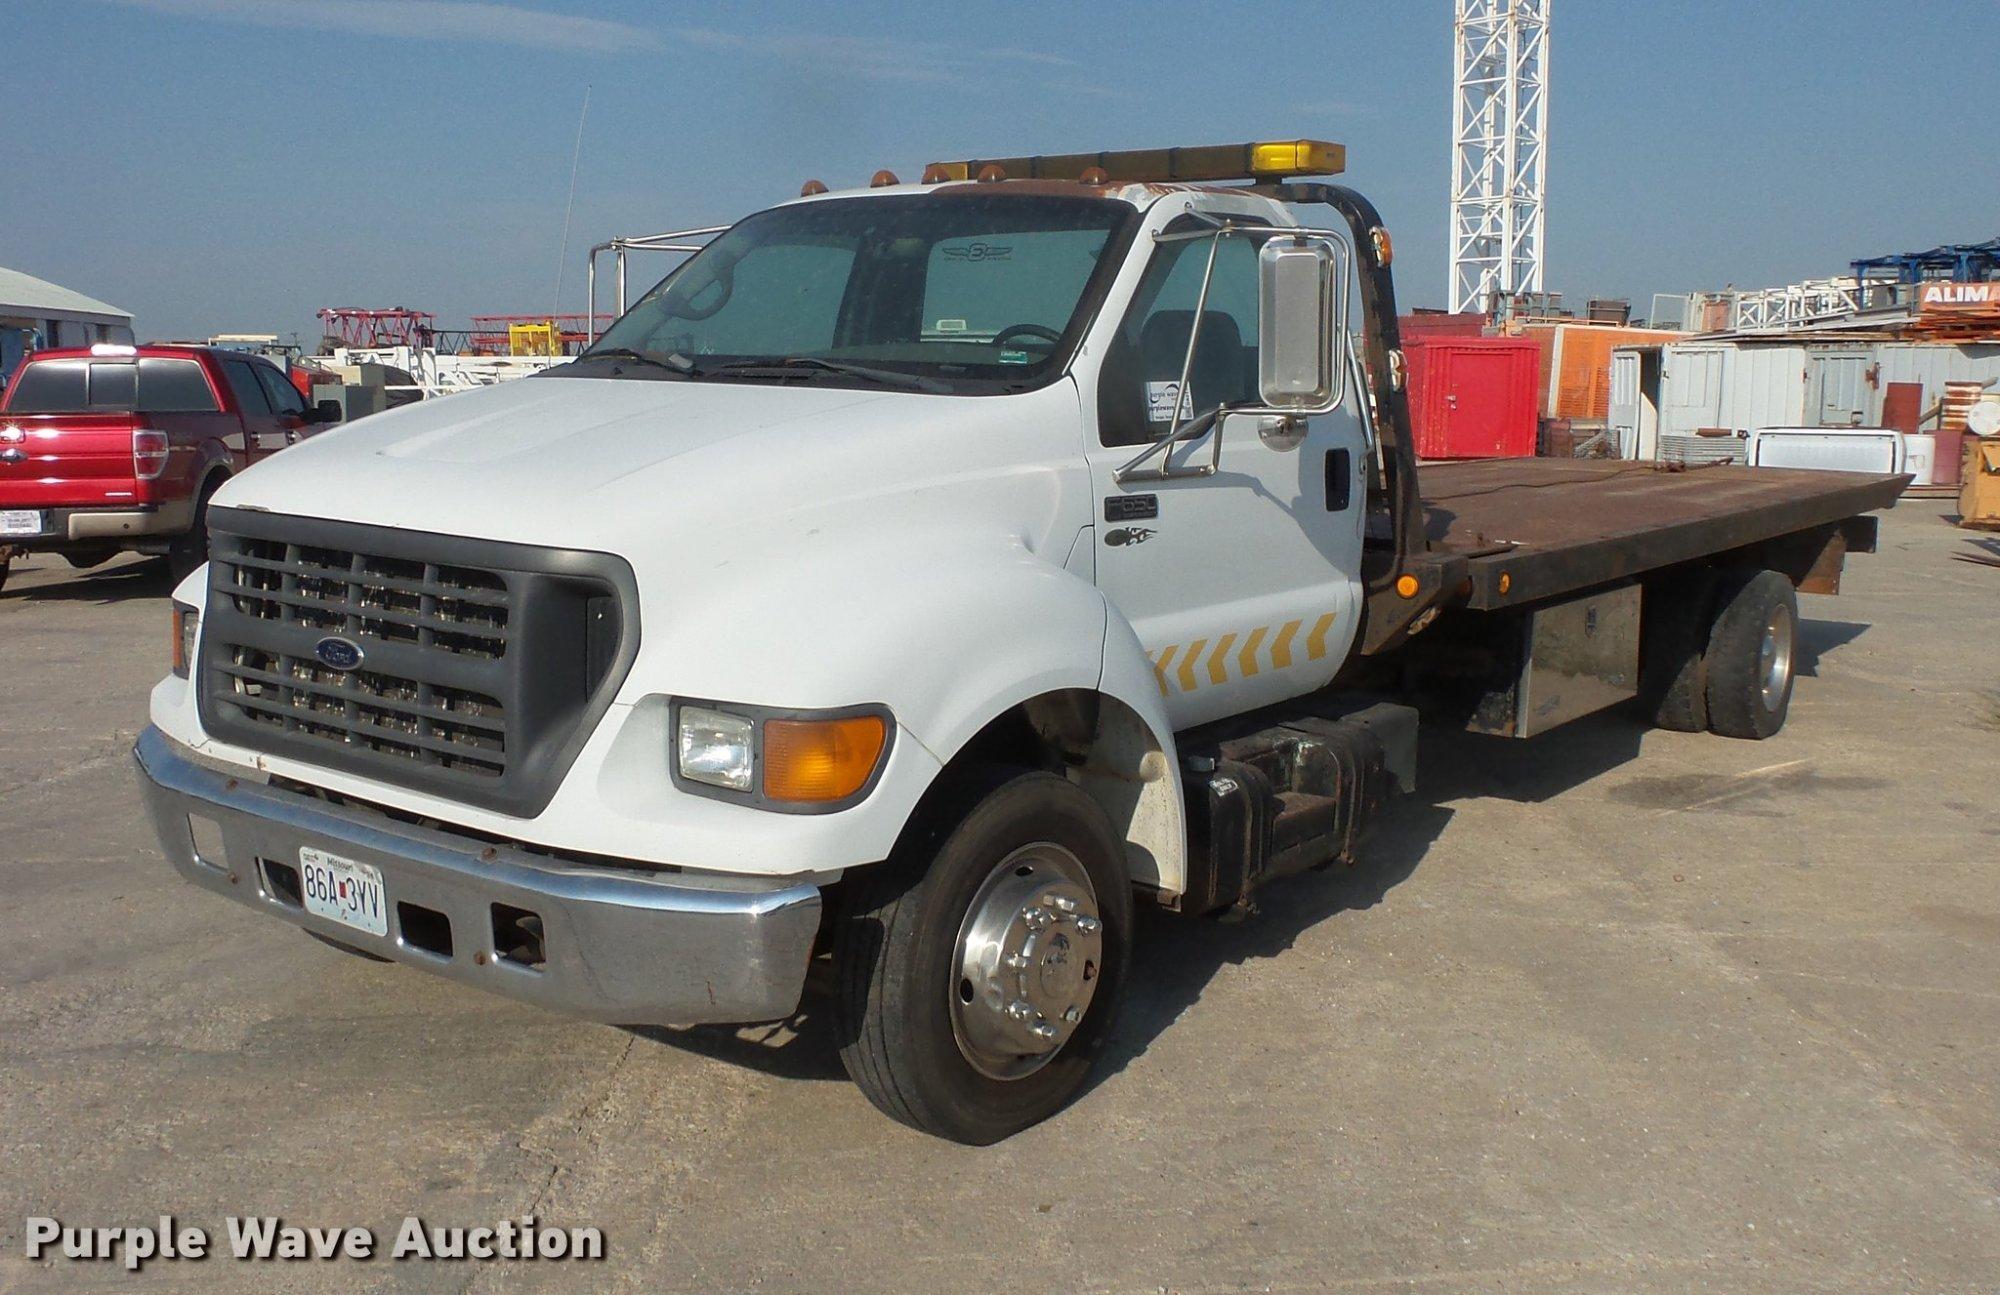 hight resolution of da3119 image for item da3119 2001 ford f650 super duty tow truck truck